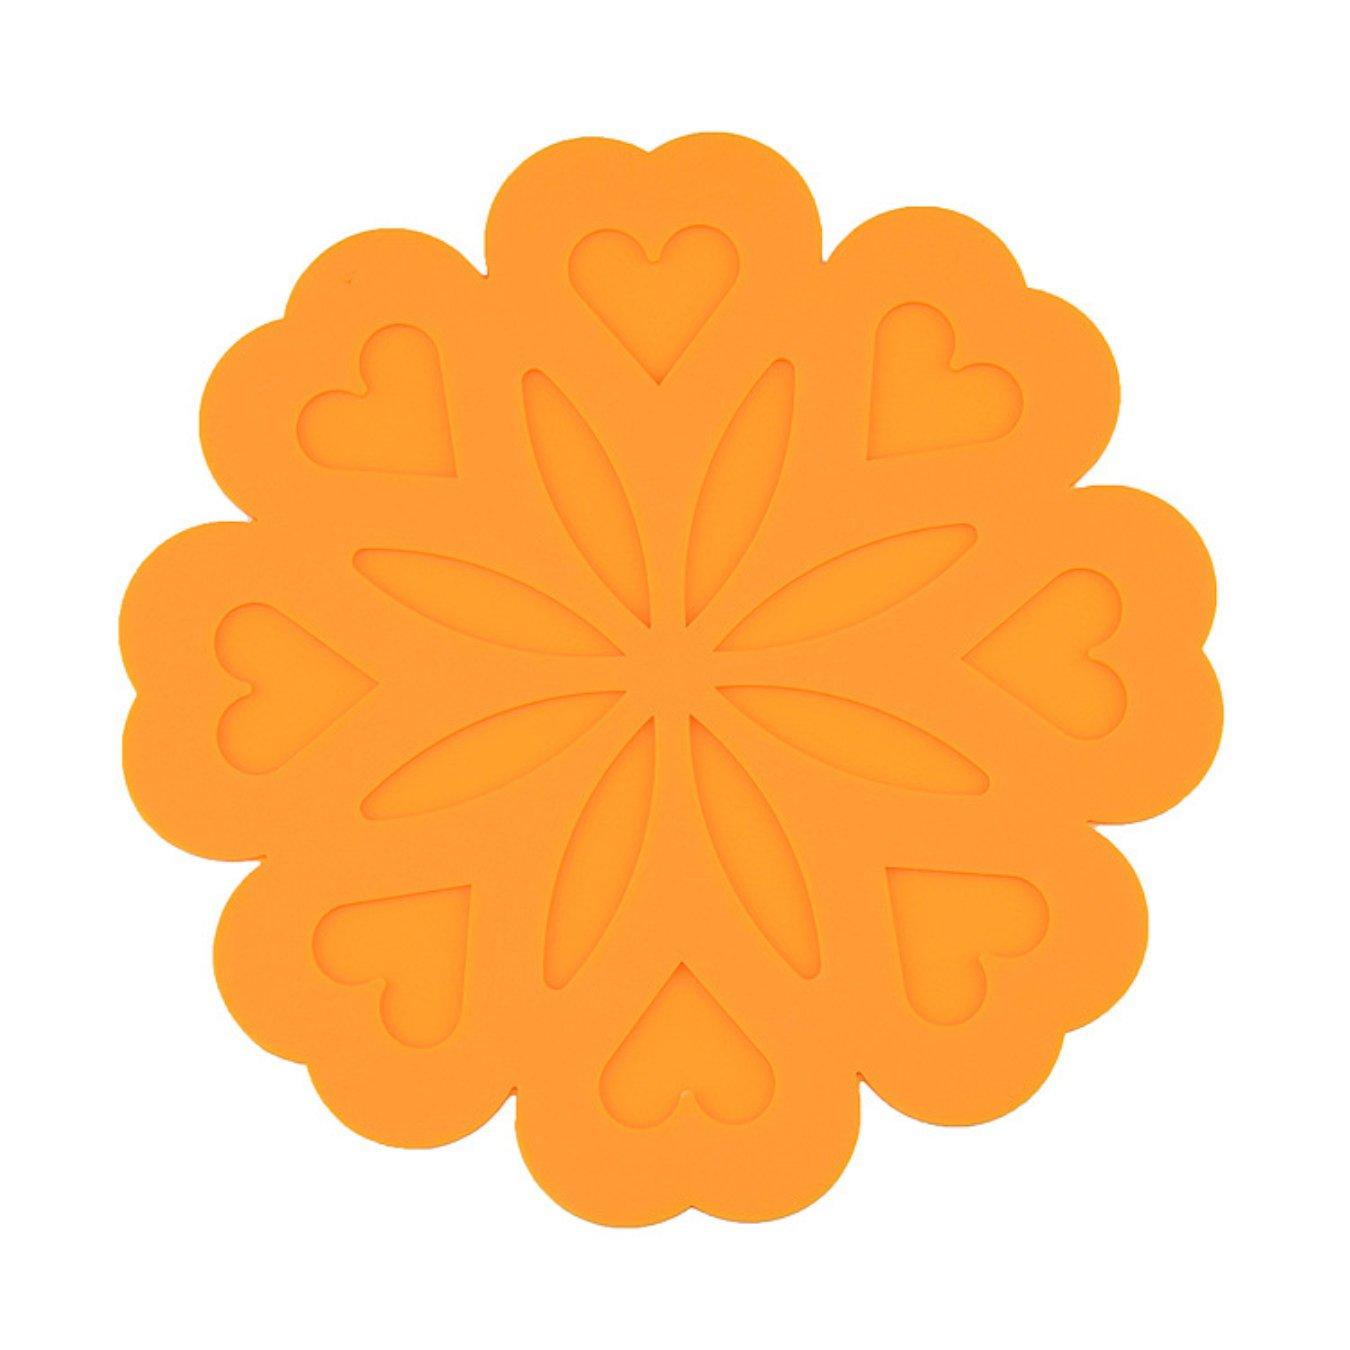 linshing-peach花型シリカゲルカップマットコースター6個(オレンジ)   B077TQSGX6